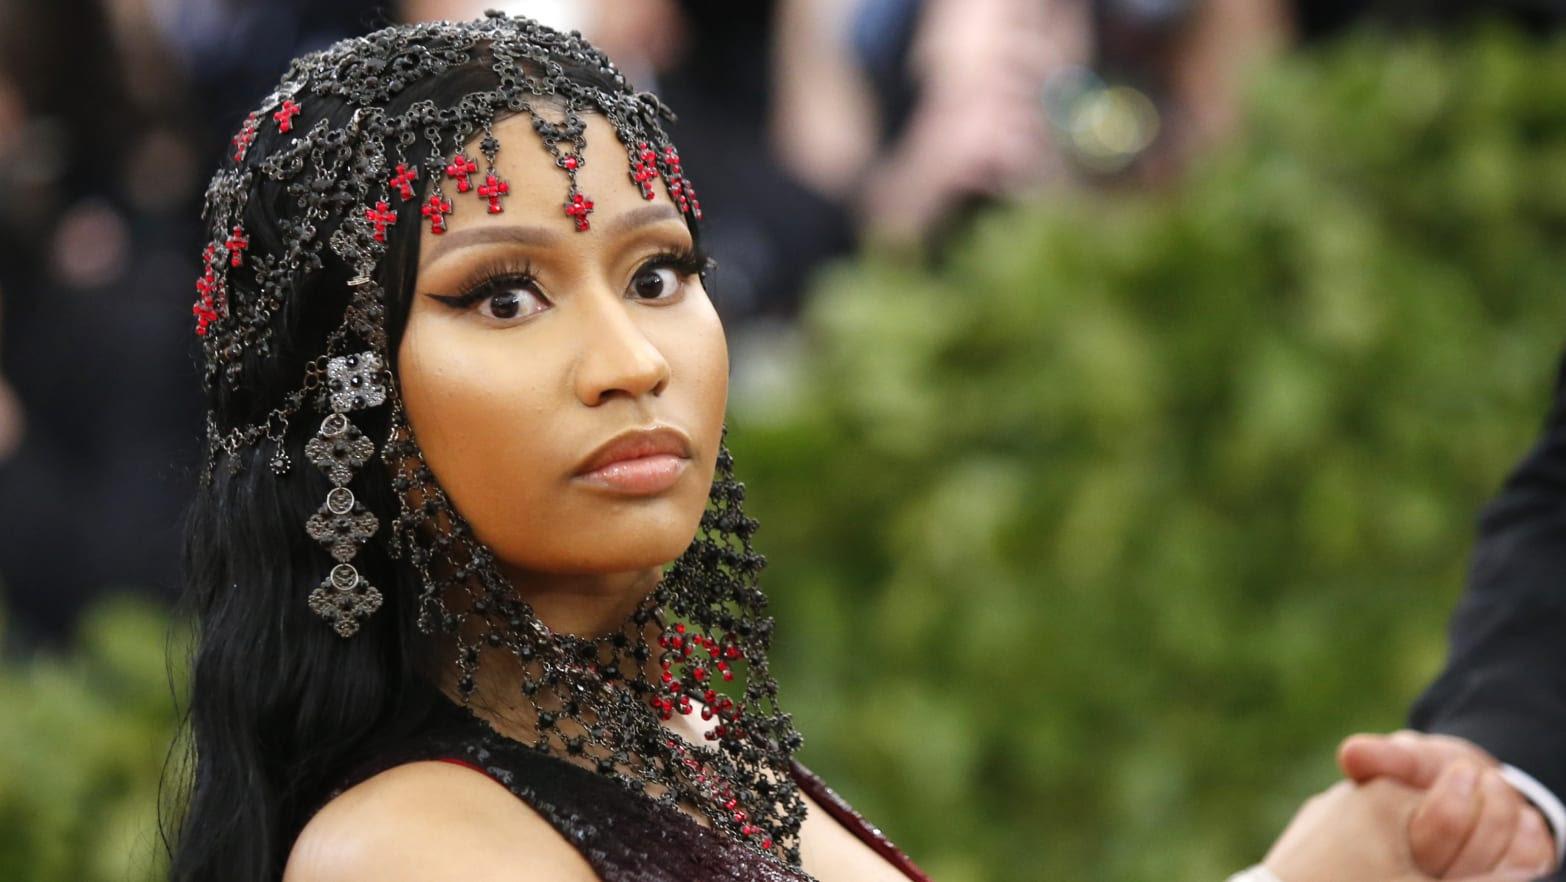 Nicki Minaj's Swollen Testicles Claim Dismissed by Trinidad and Tobago Health Minister Terrence Deyalsingh